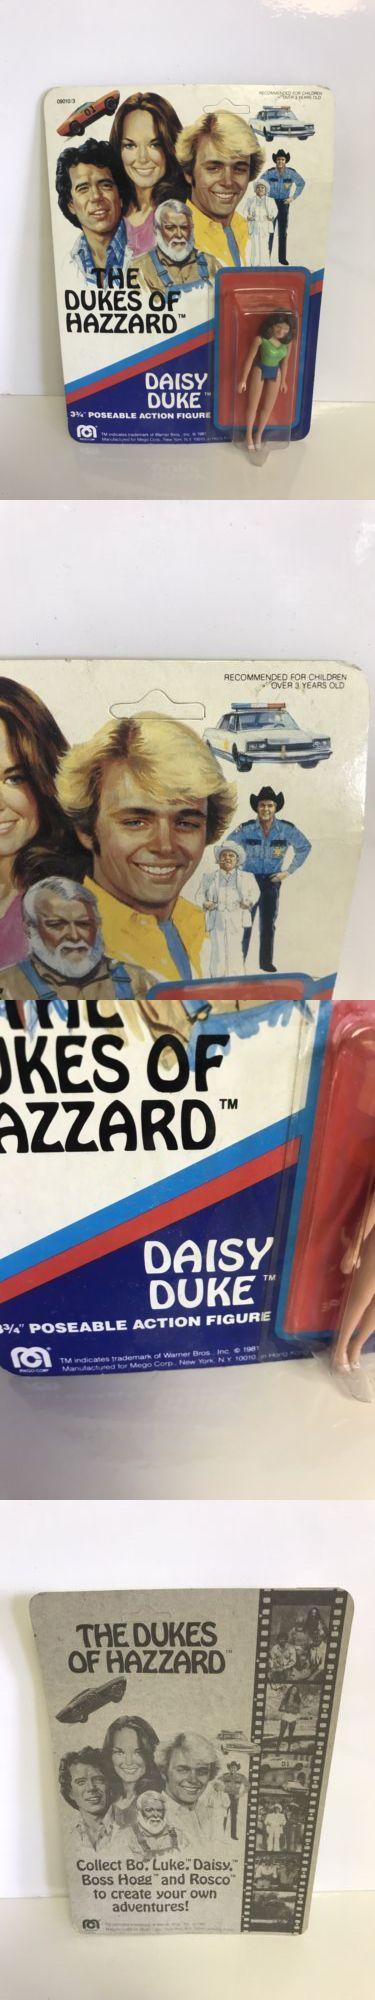 Dukes of Hazzard 20908: Vintage The Mego Dukes Of Hazzard Daisy Duke 8 Action Figure -> BUY IT NOW ONLY: $99.99 on eBay!